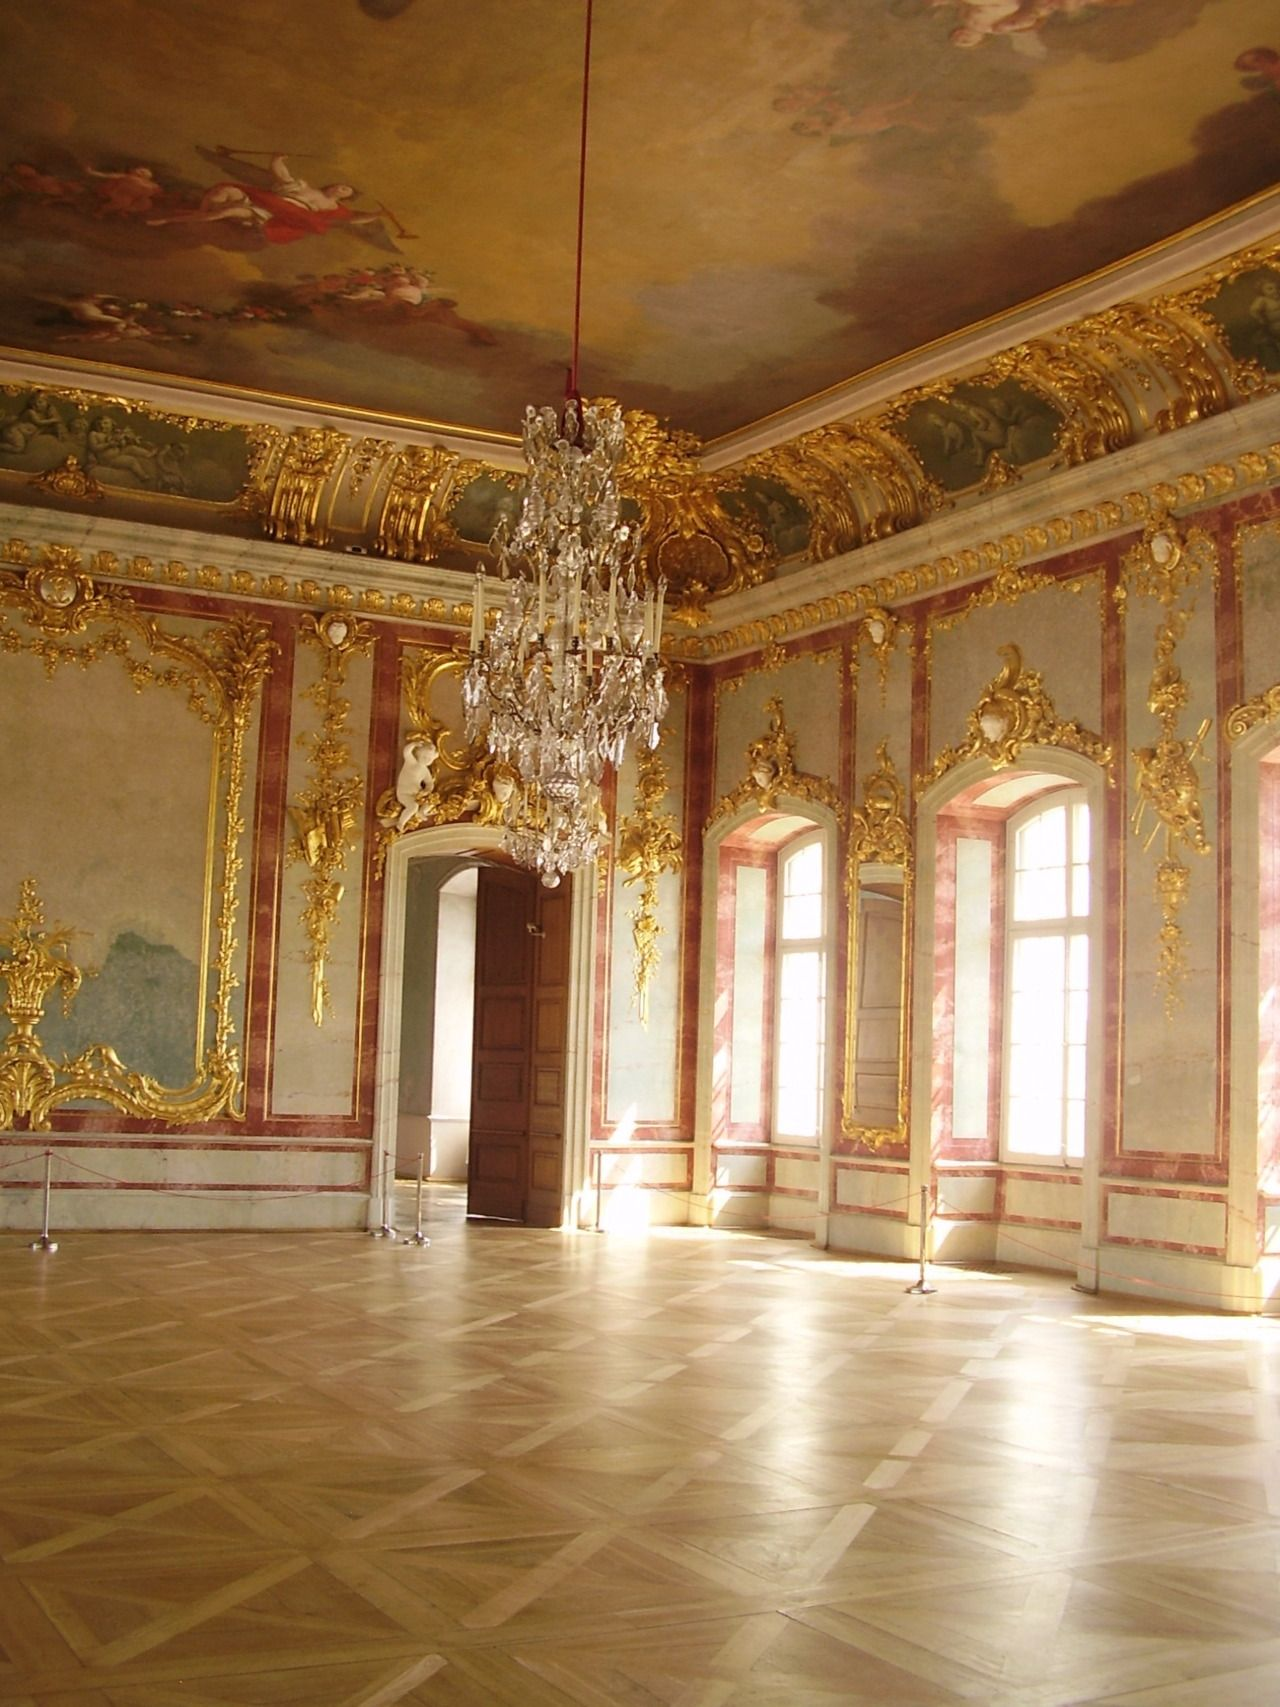 rundale palace i can imagine the dancing wish i were a princess rh pinterest com